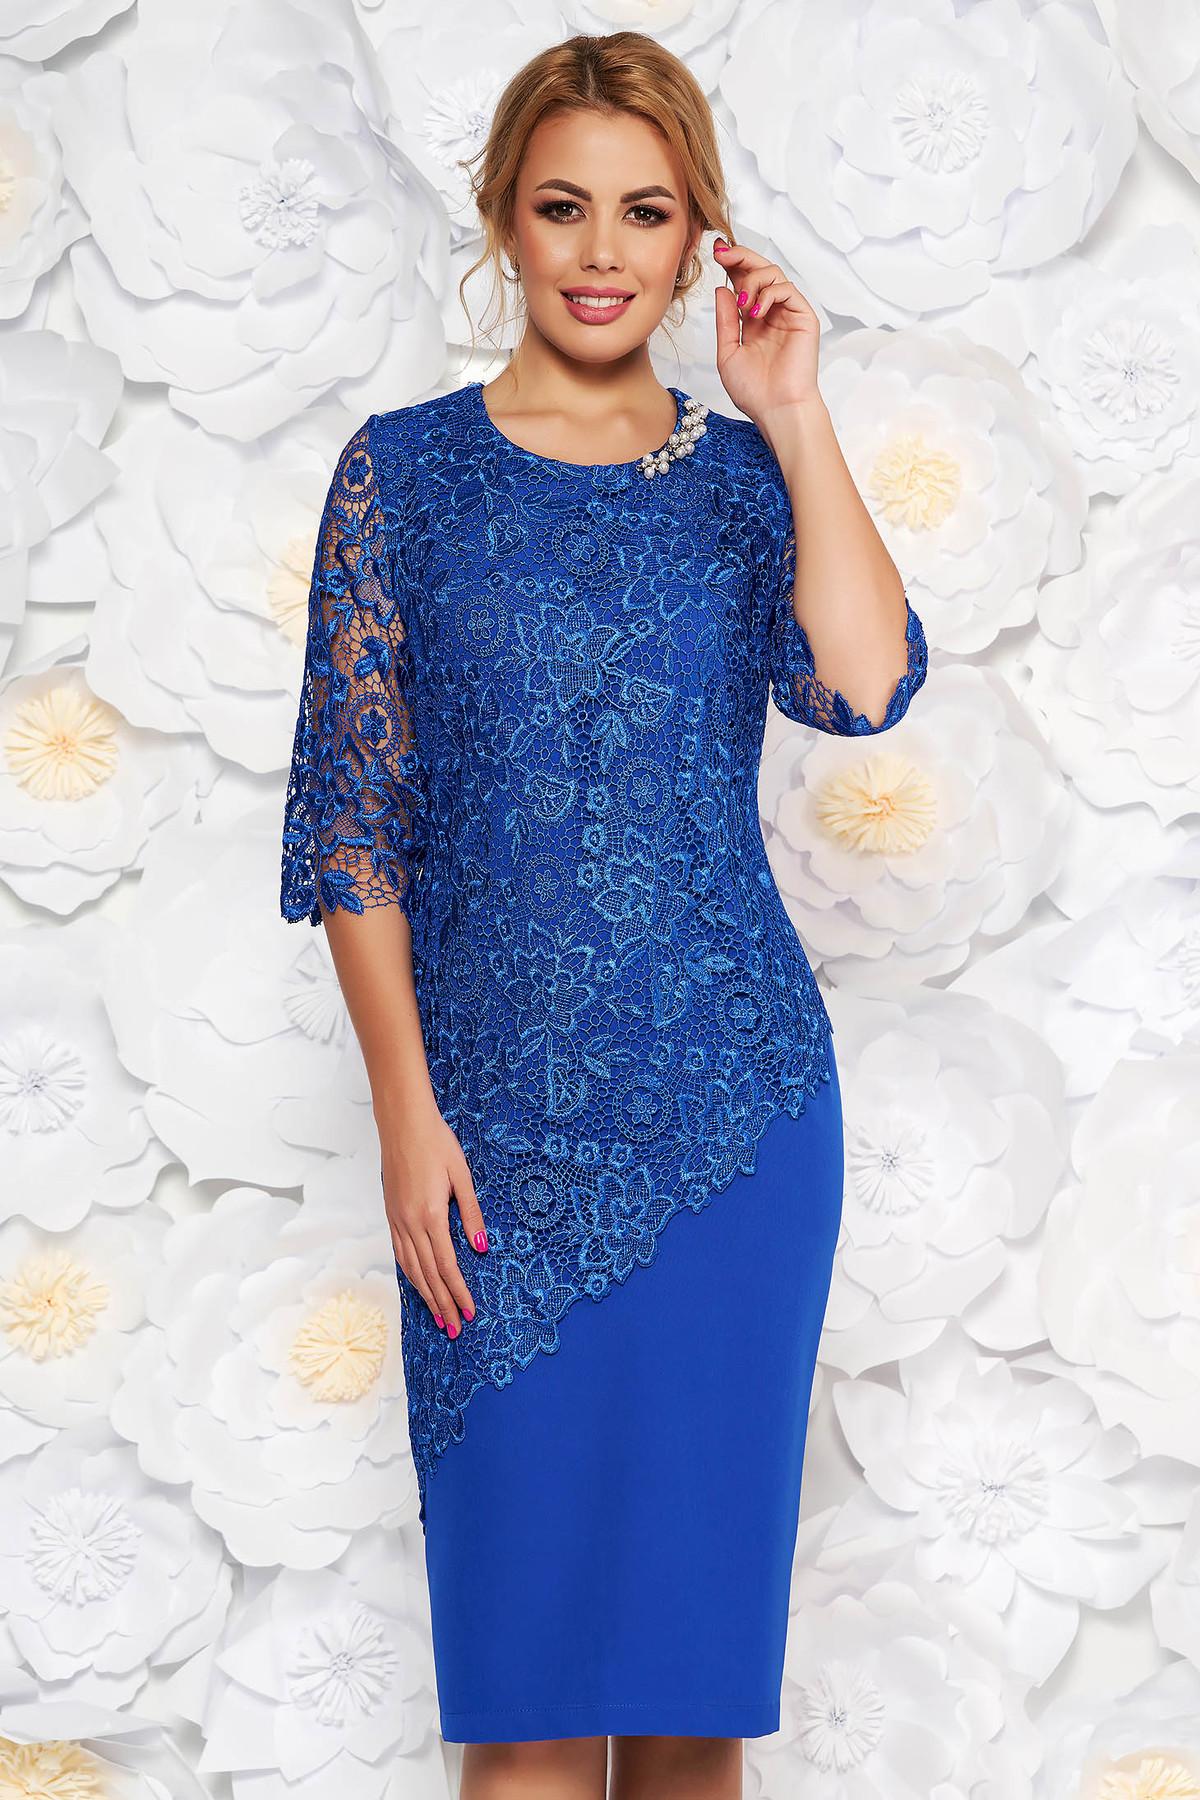 Rochie albastra de ocazie midi cu maneca 3/4 cu un croi mulat din stofa usor elastica suprapunere cu dantela